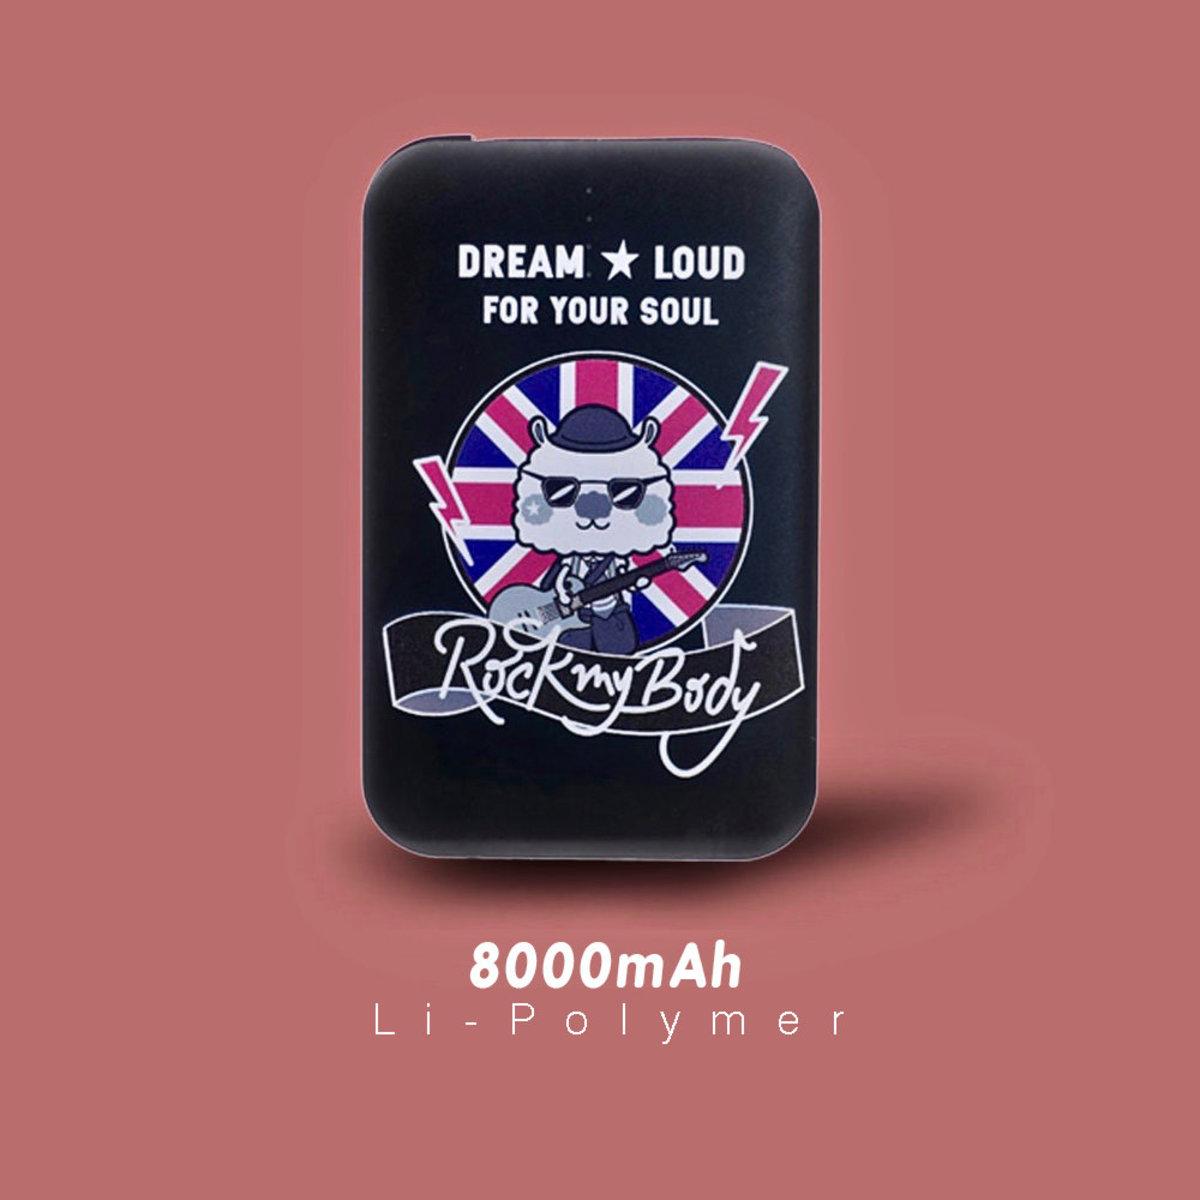 Sing Sing  Rabbit . Rock on Music / 8000mAh 快速. 輕便. 安全. 行動電源